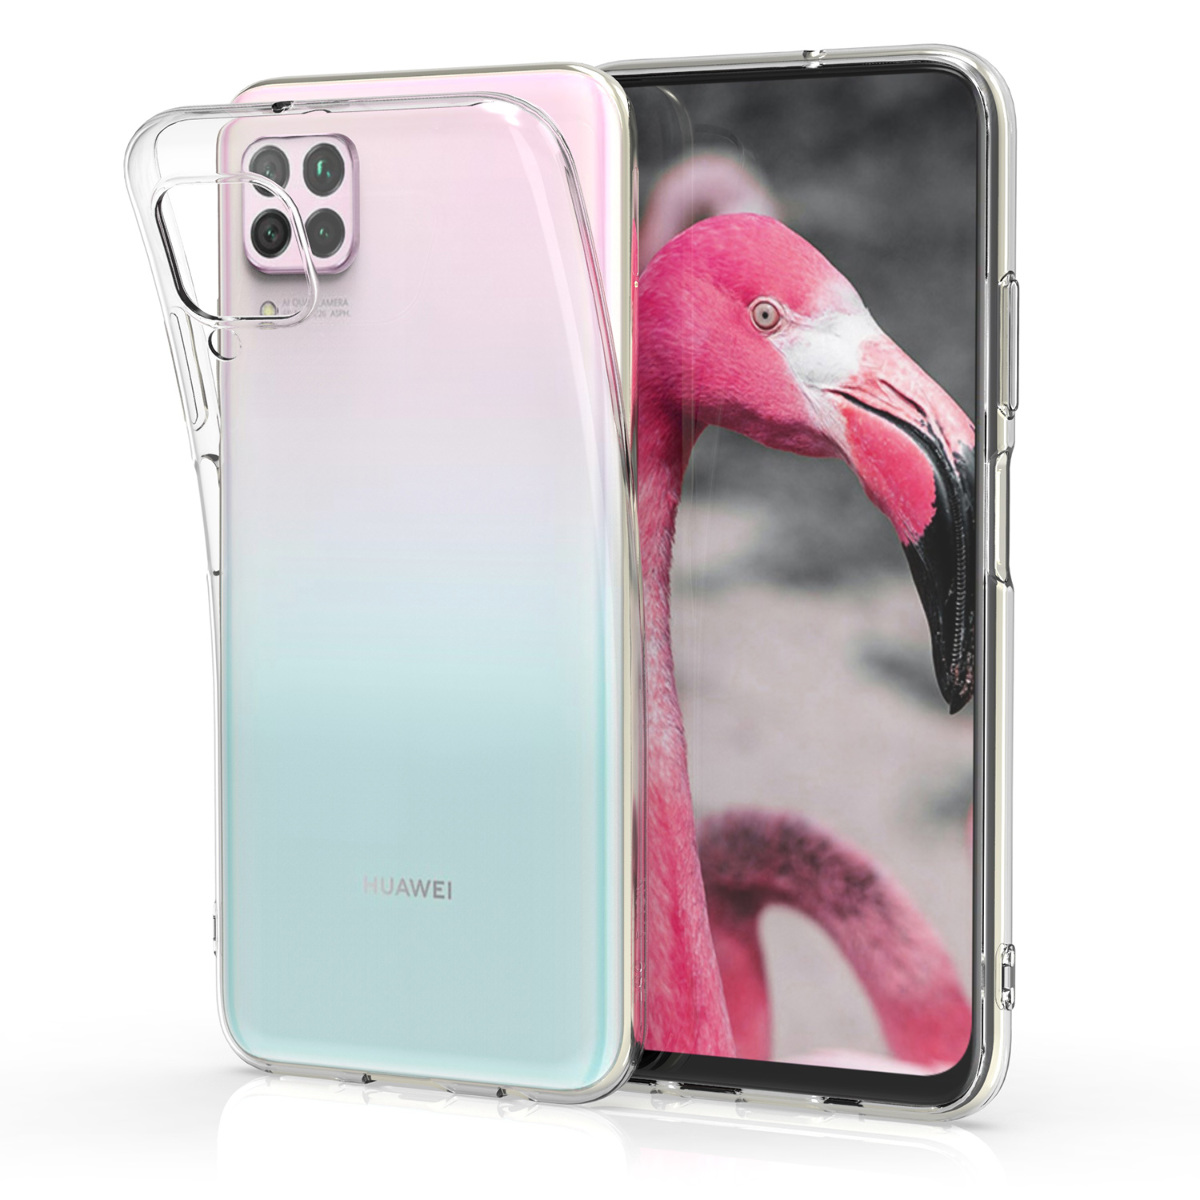 KW Θήκη Σιλικόνης Huawei P40 Lite - Transparent (51466.03)